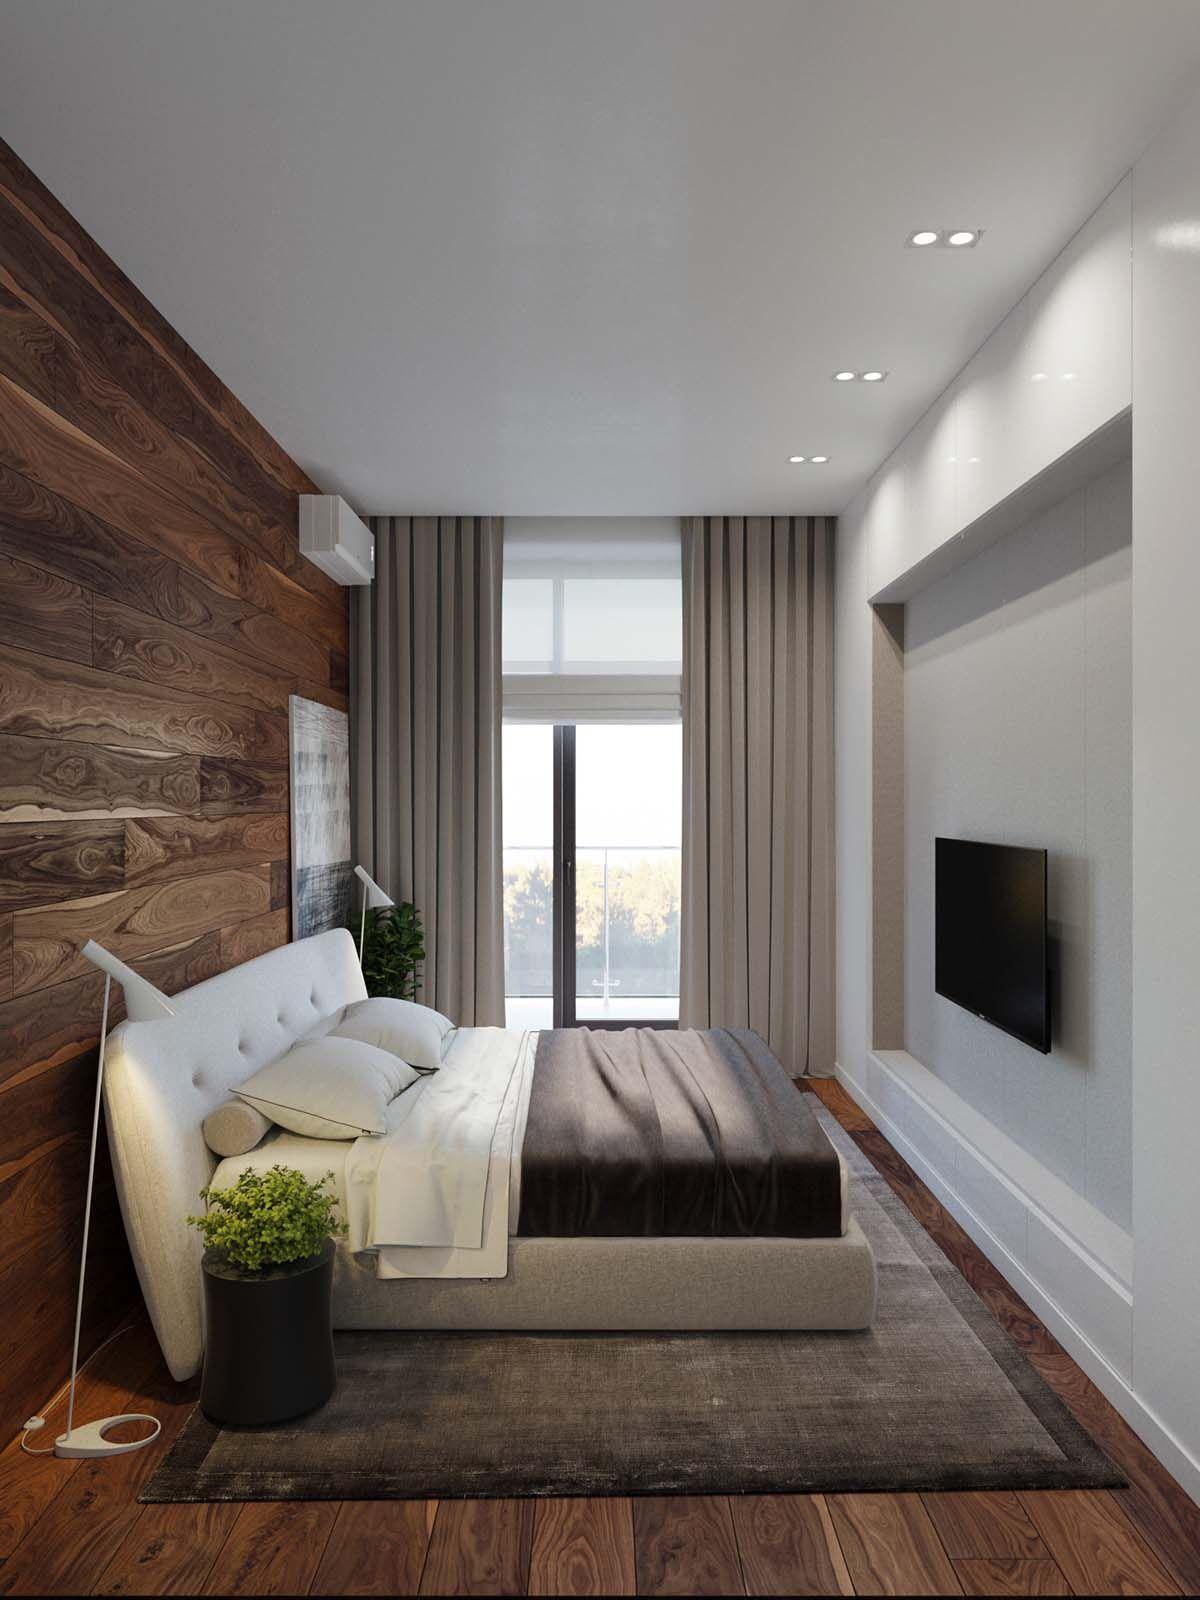 modern bedroom design Modern bachelor pad with dramatic design features in Kiev | KINDESIGN | Pinterest | Modern